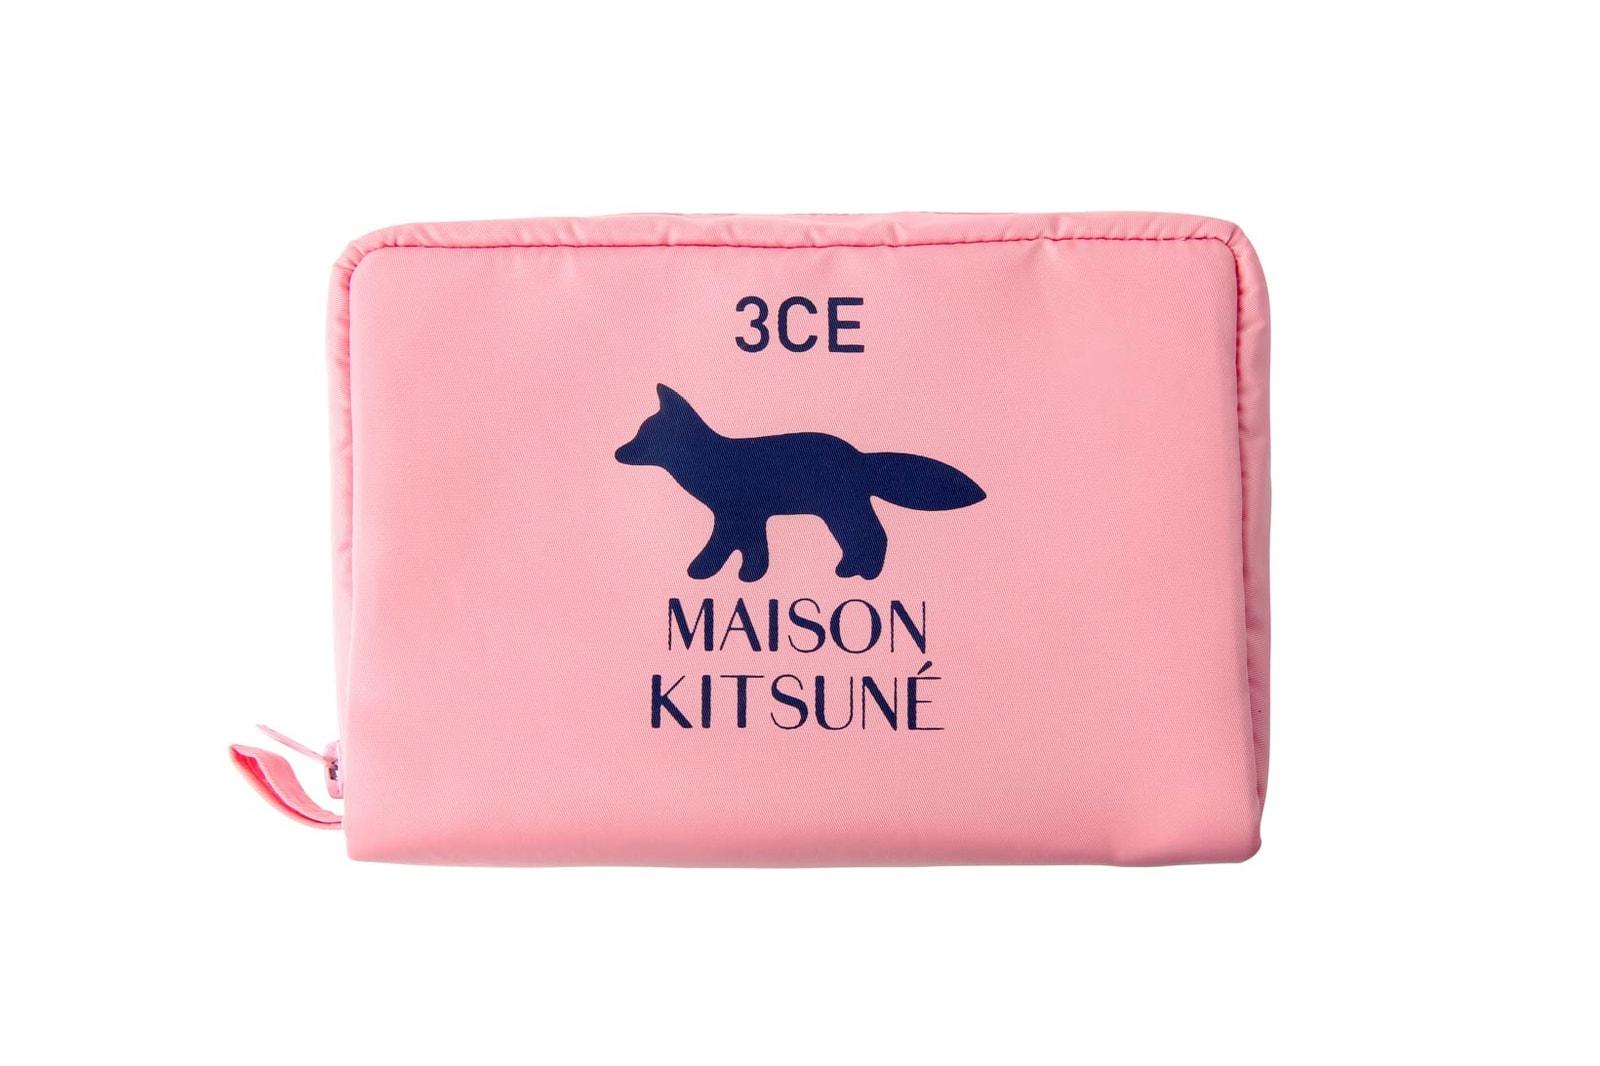 Maison Kitsuné 3CE Makeup Collection Stylenanda Korea